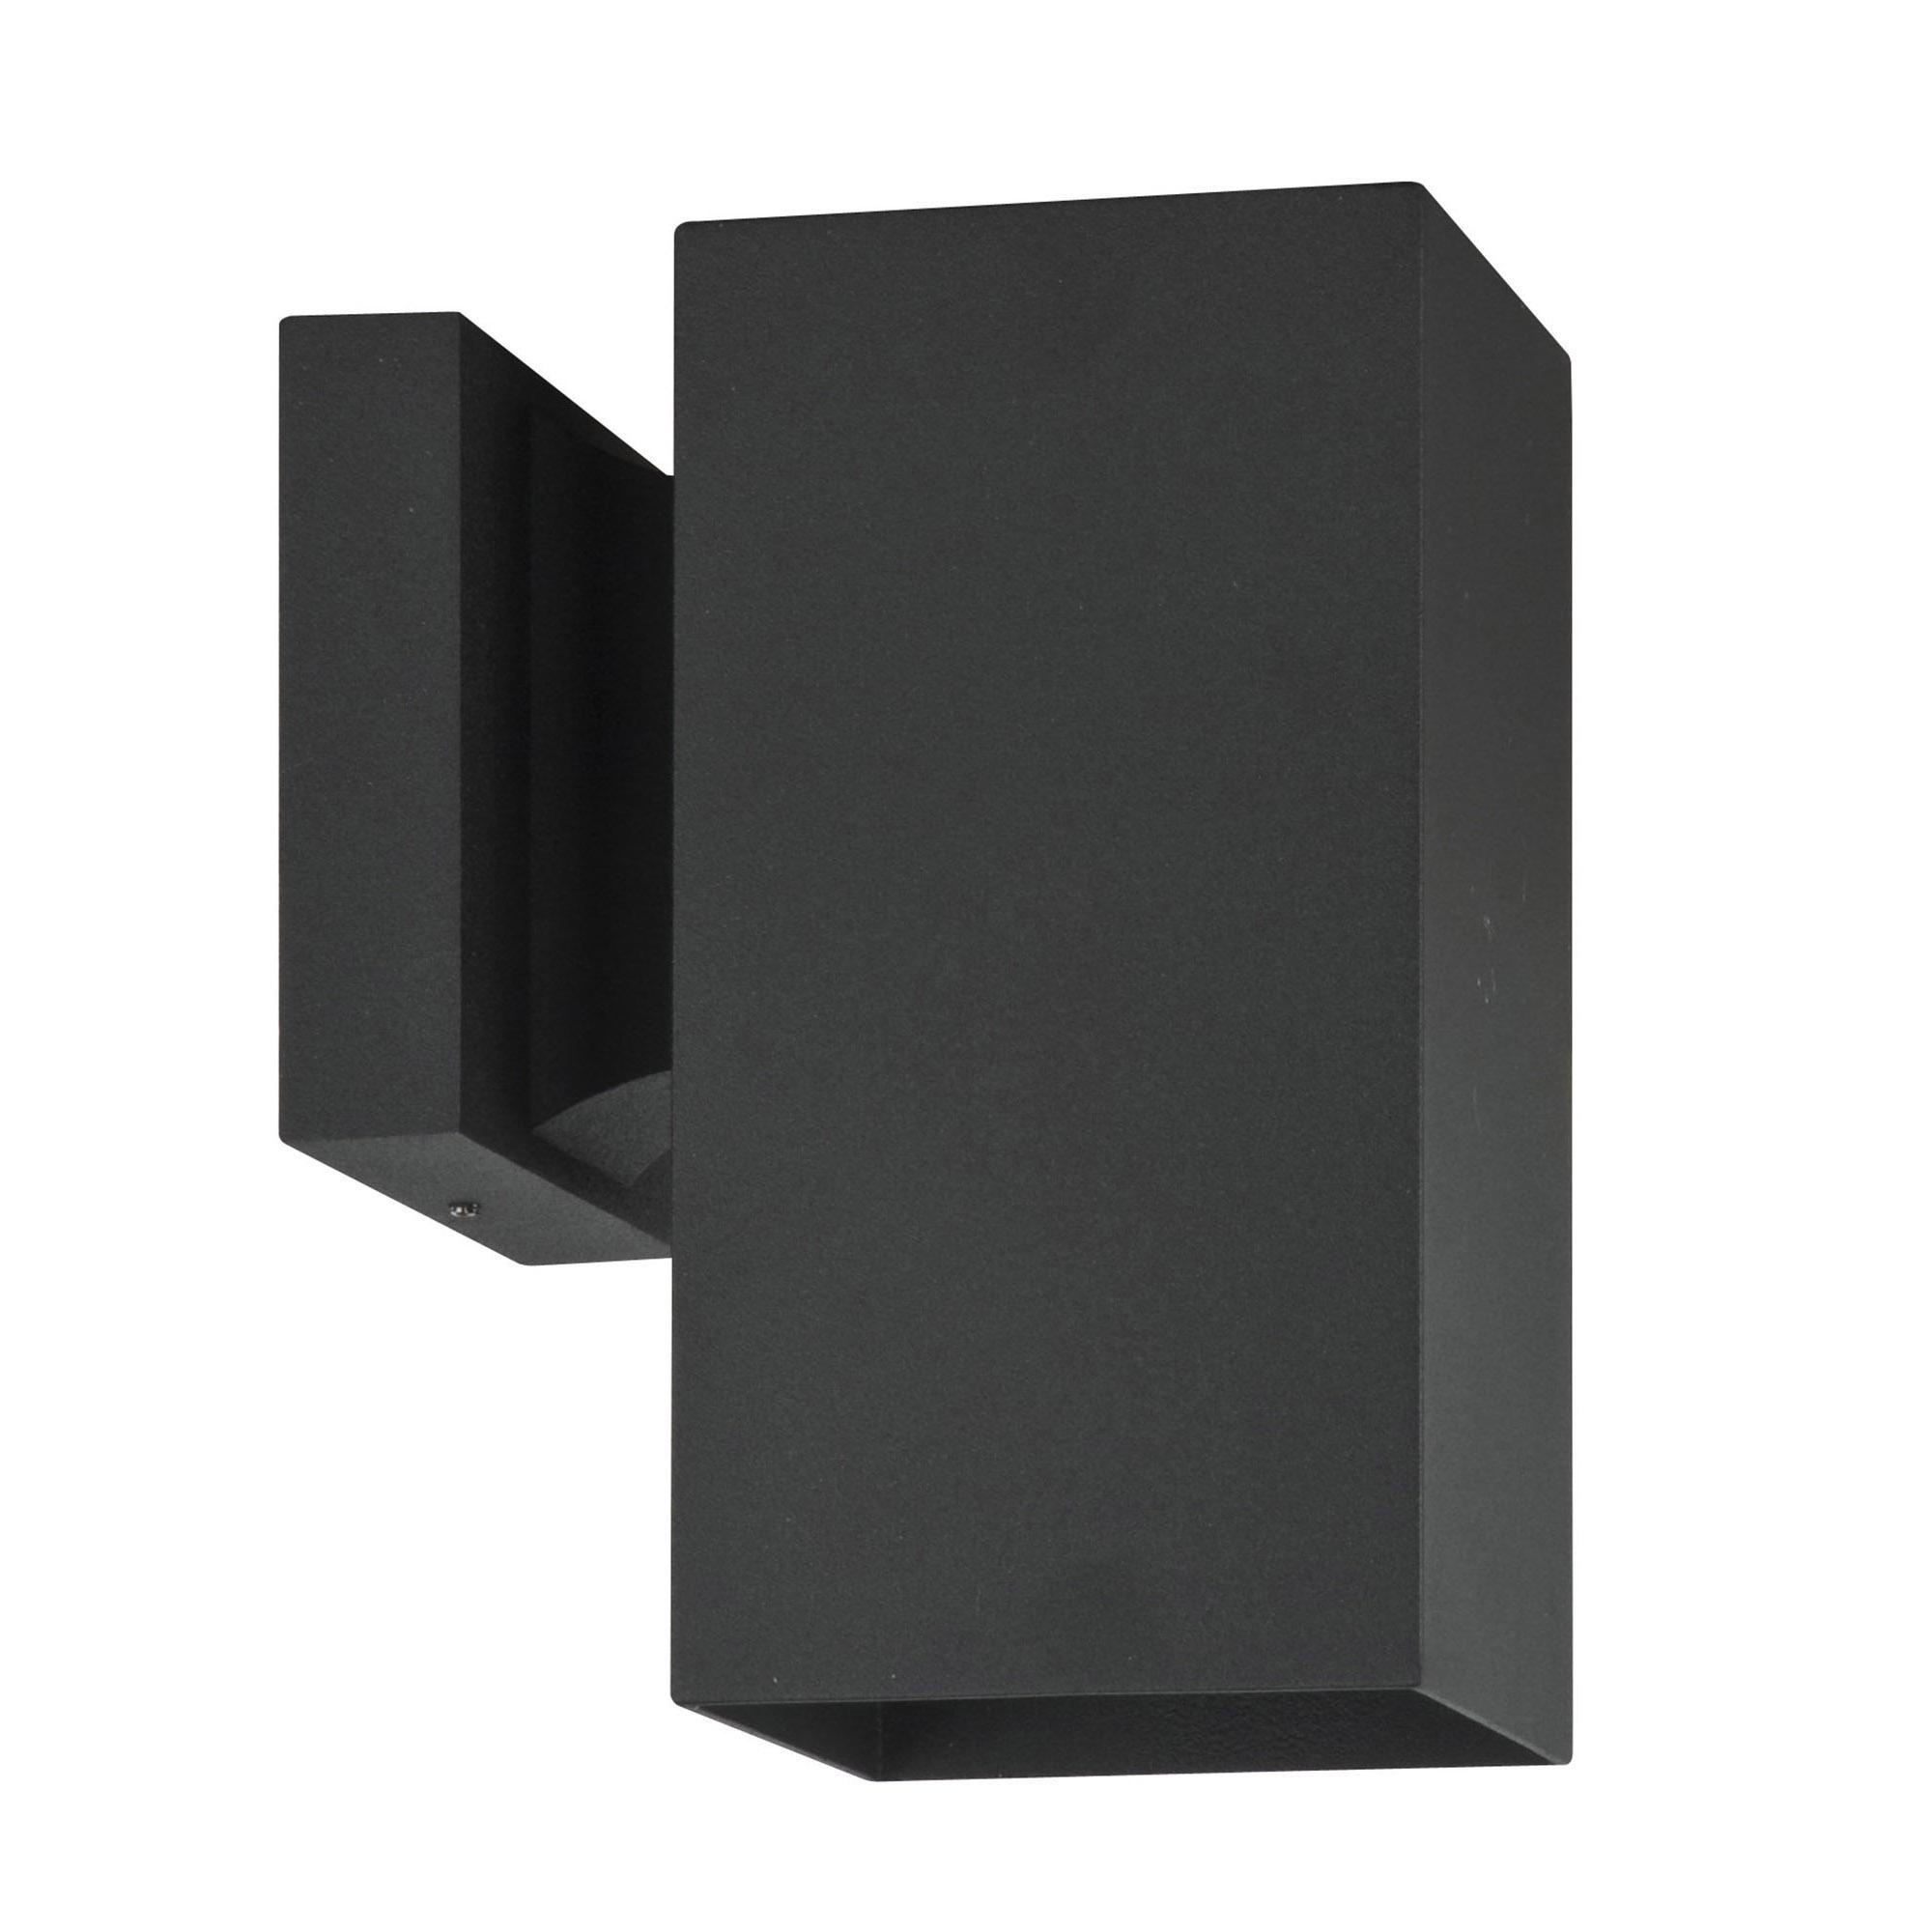 Sunset Lighting Square One Light Exterior - Aluminum Sconce, With Black Finish